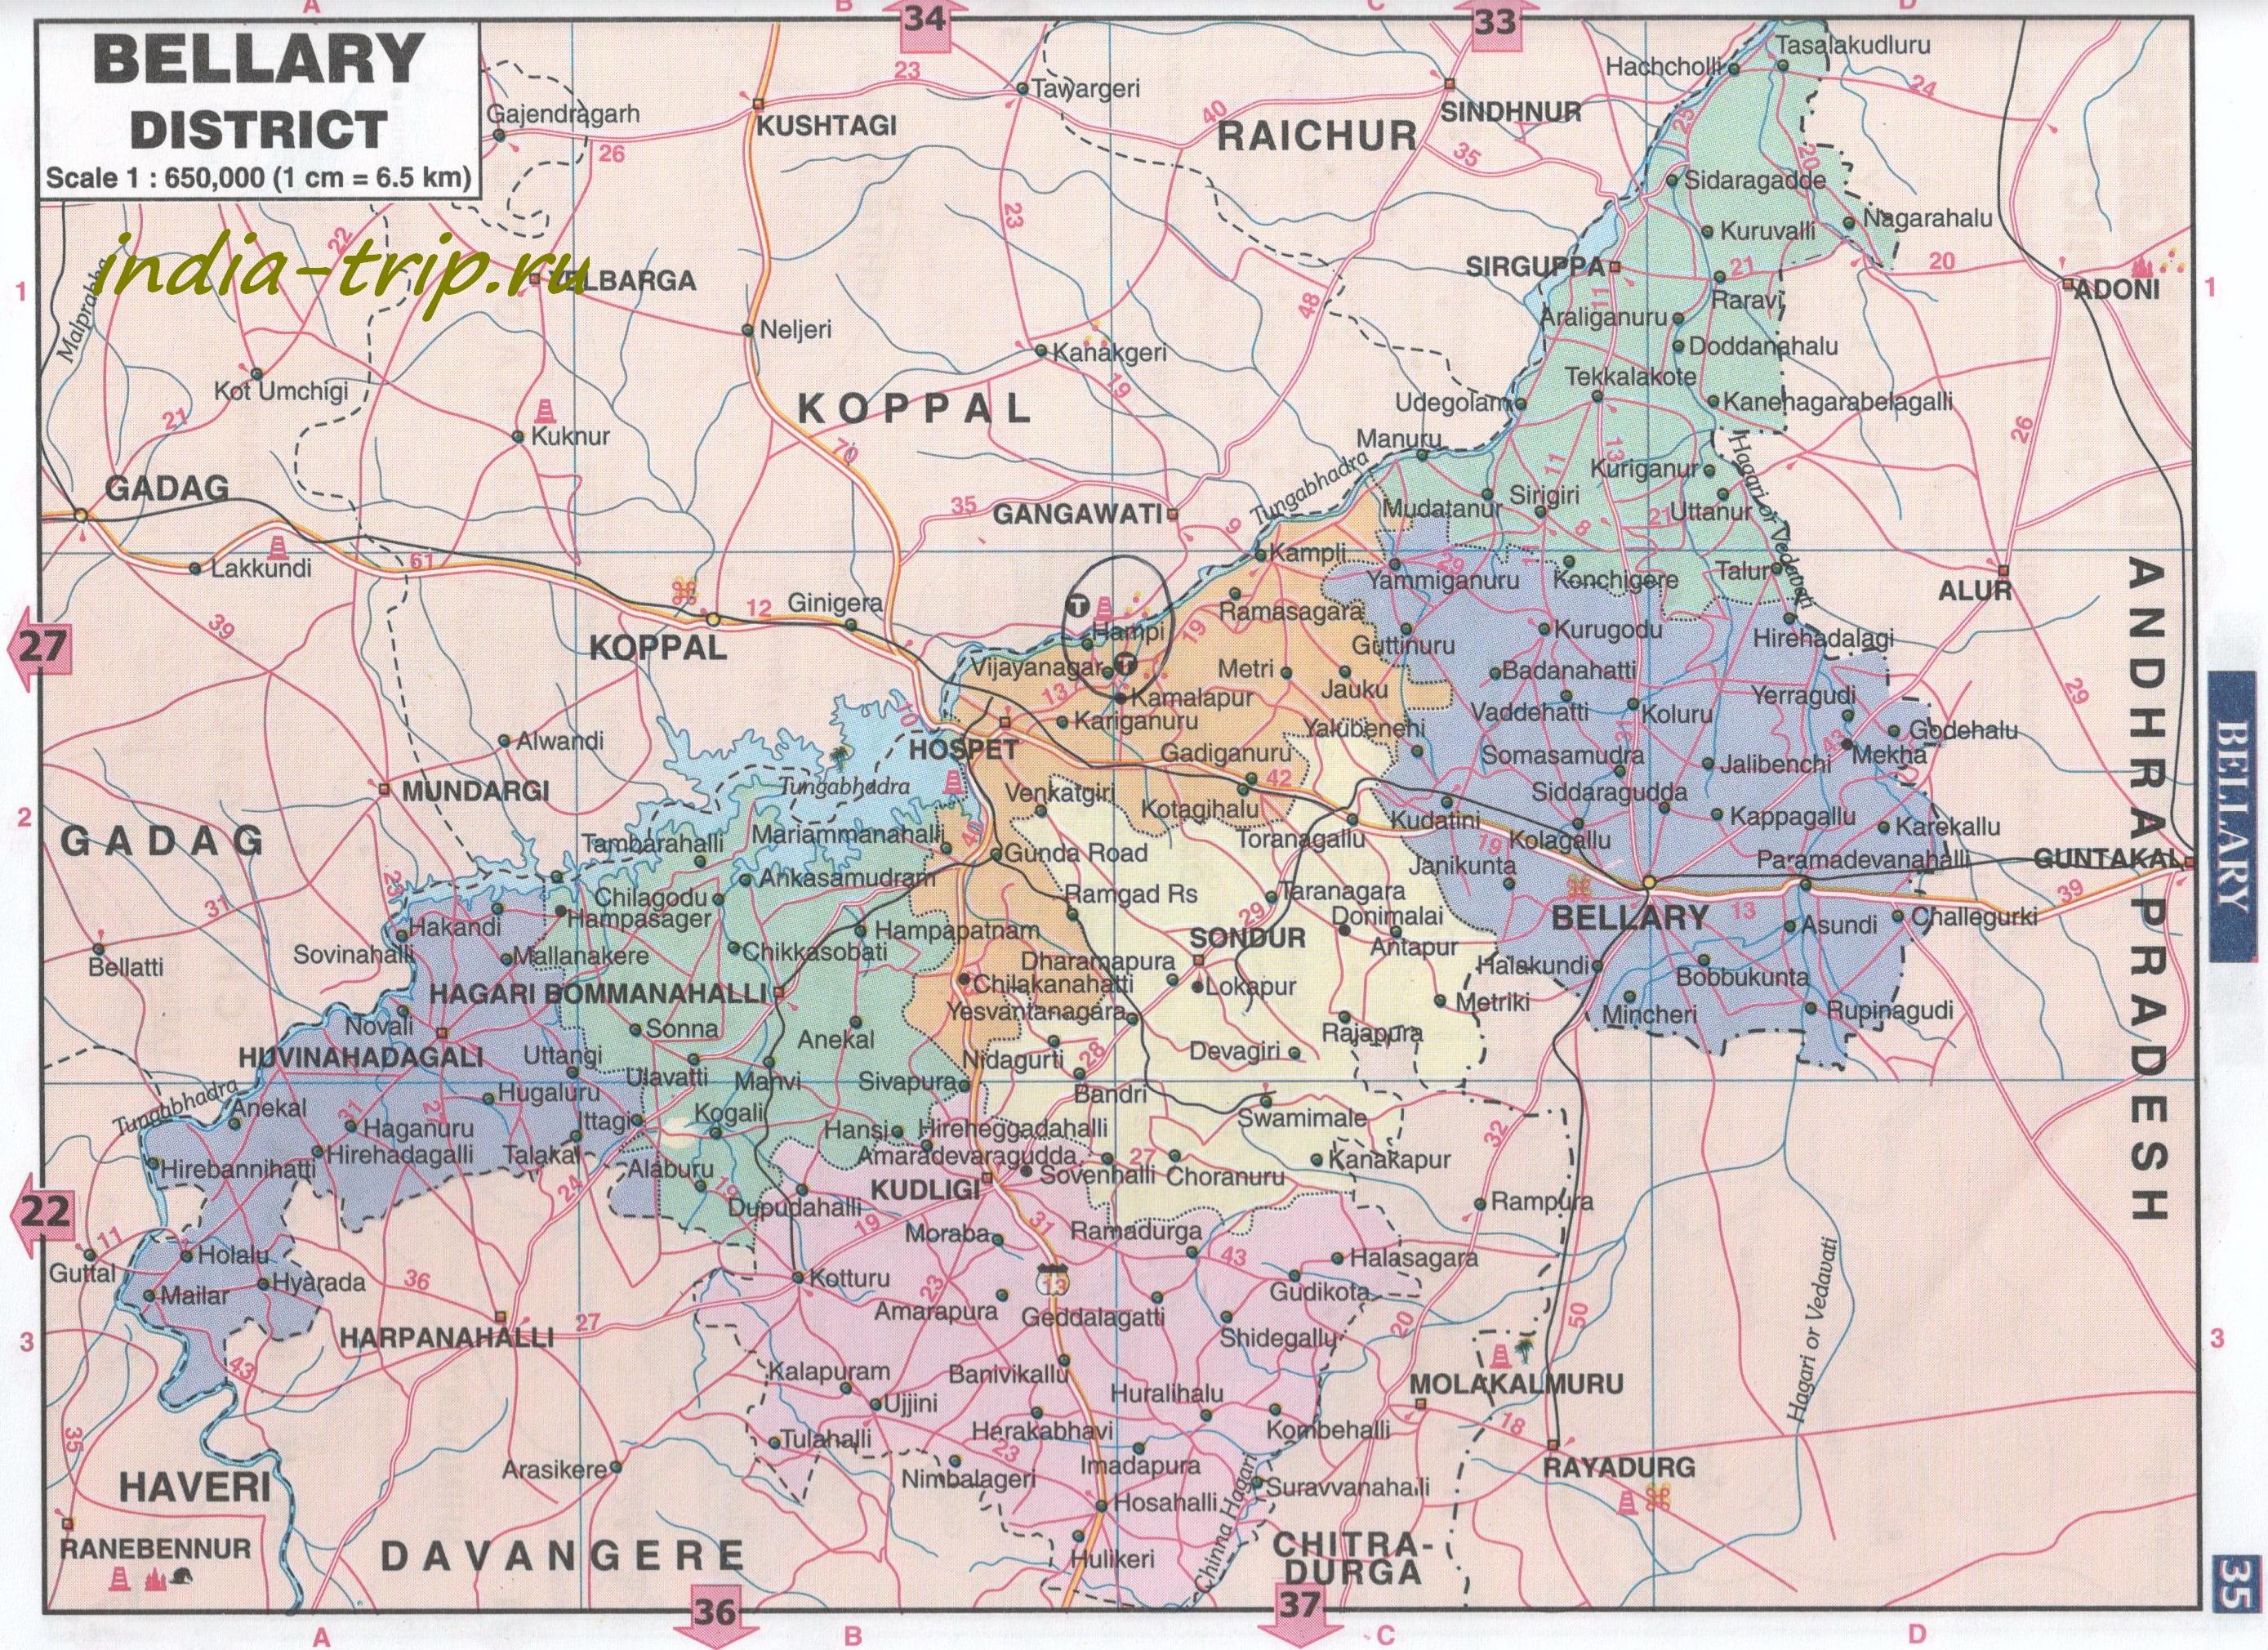 Хампи на карте округа Беллари